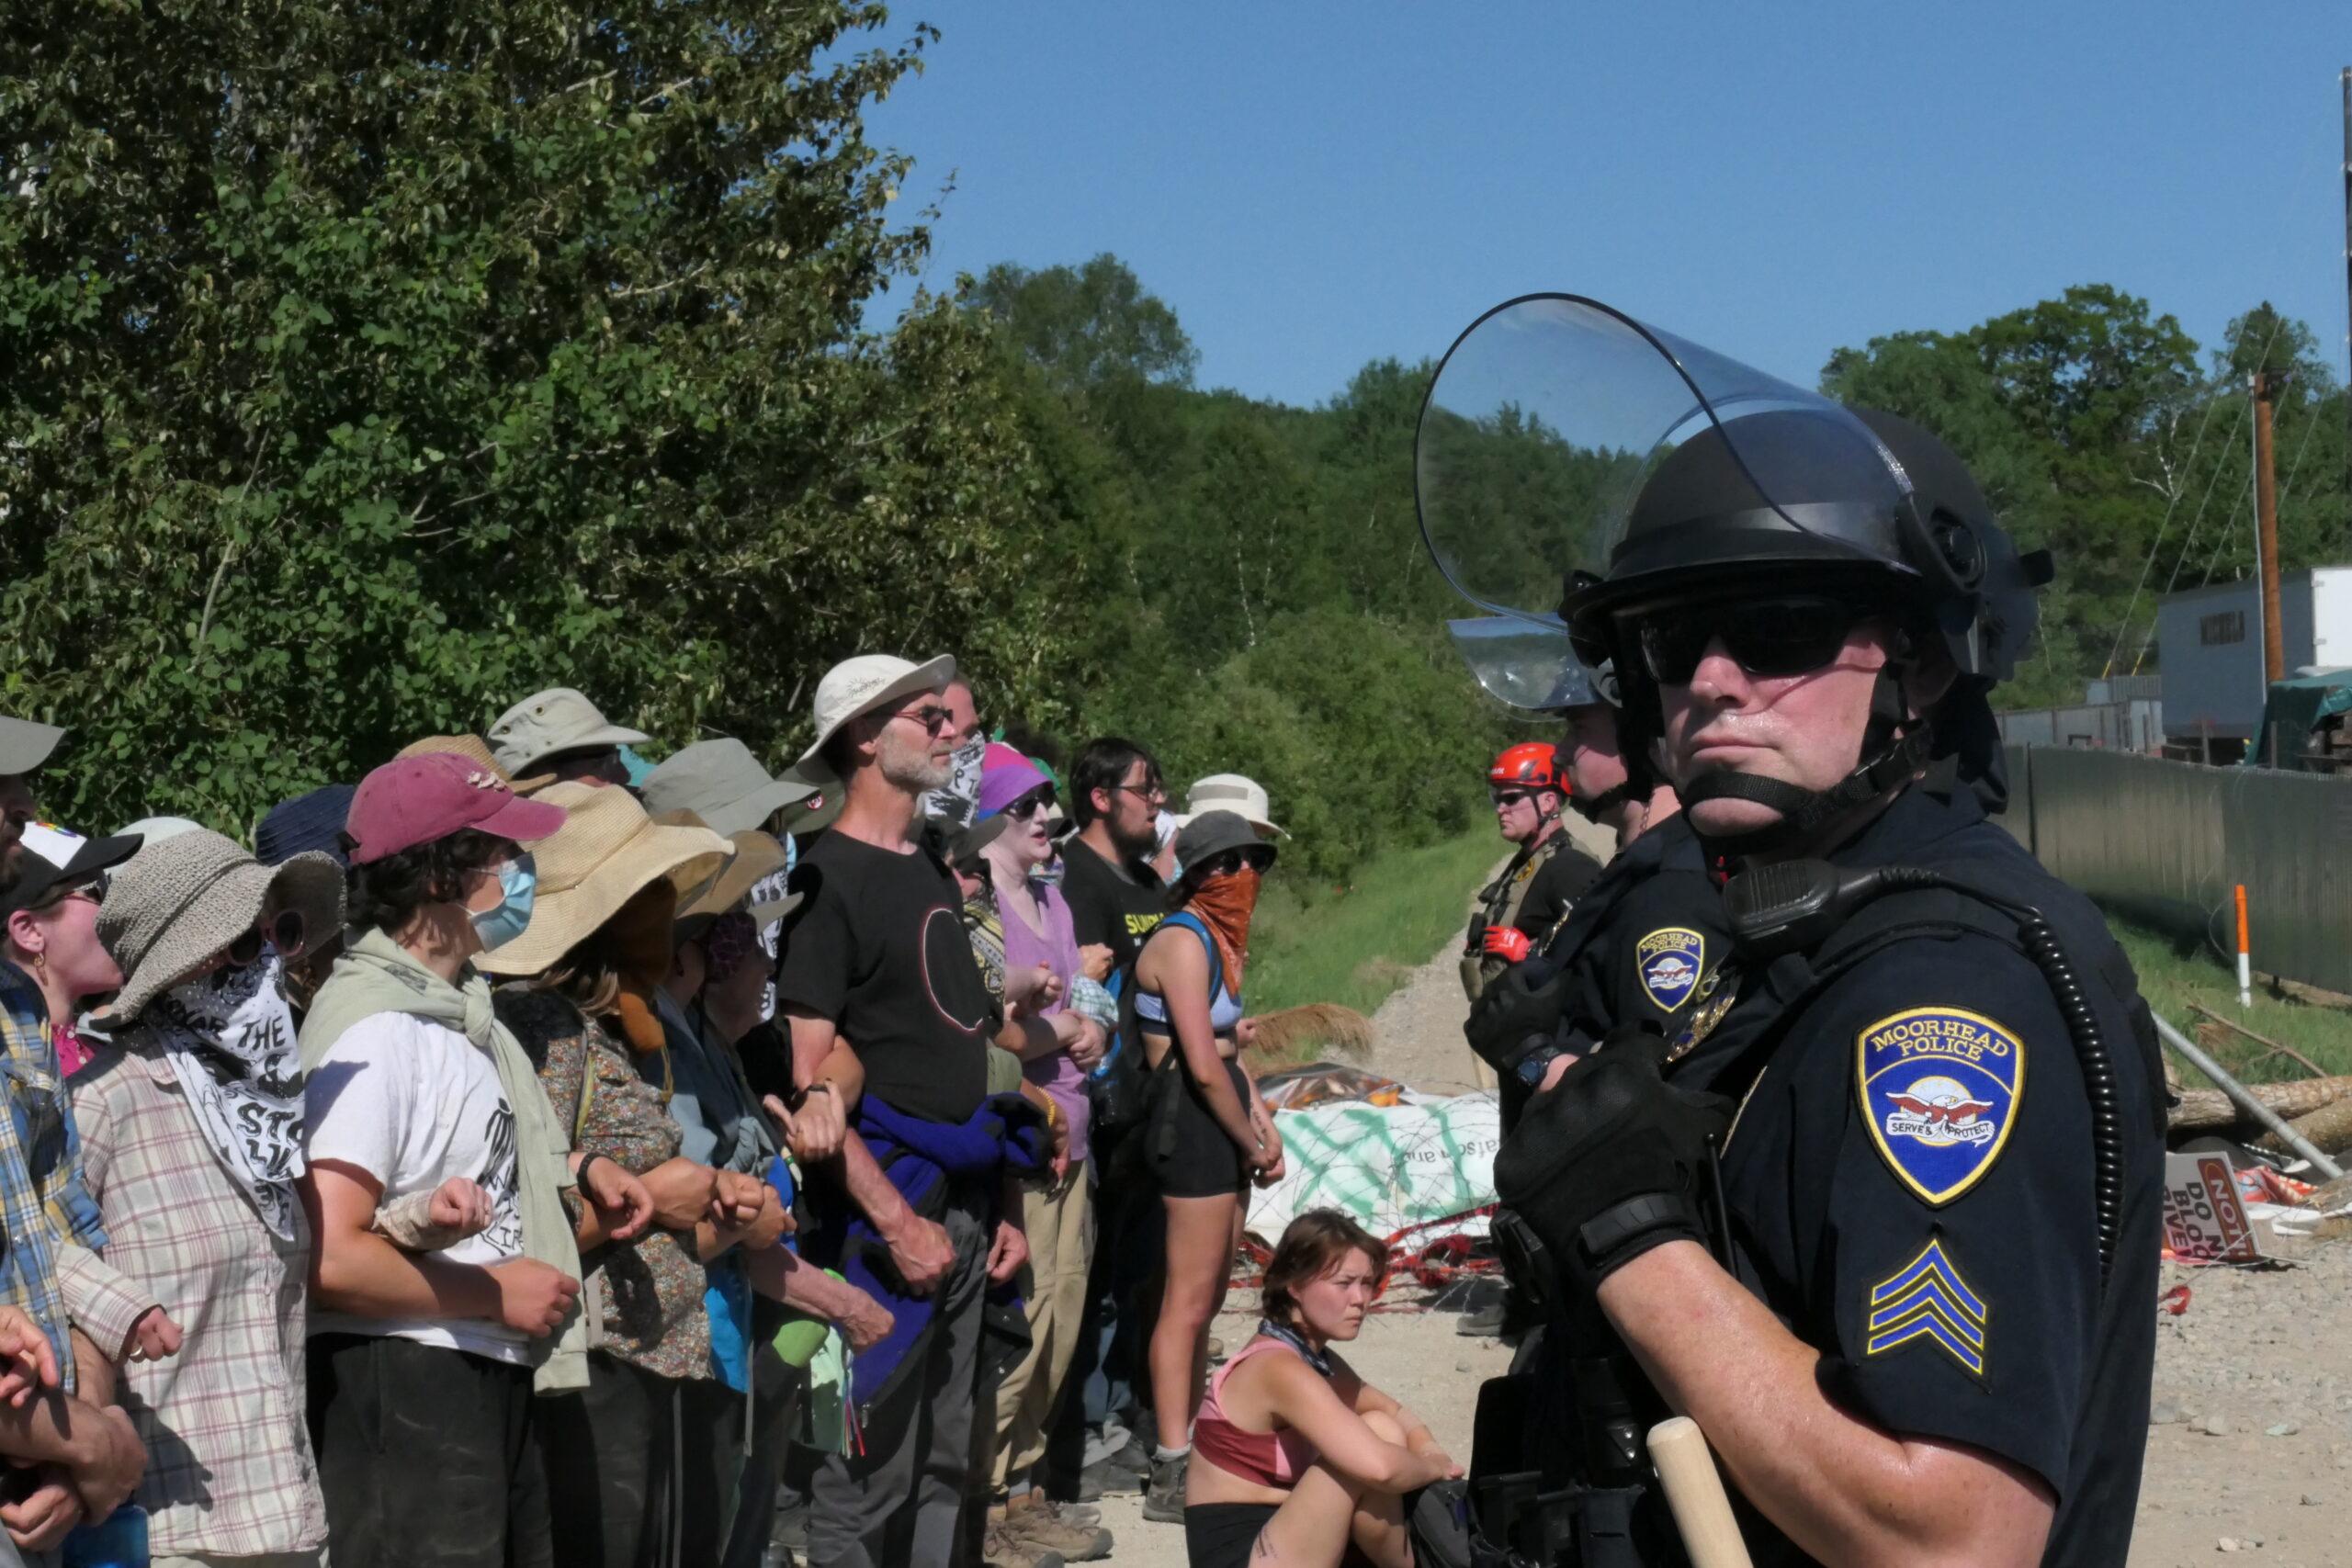 Demonstrators converge on Enbridge pipeline construction, dozens arrested